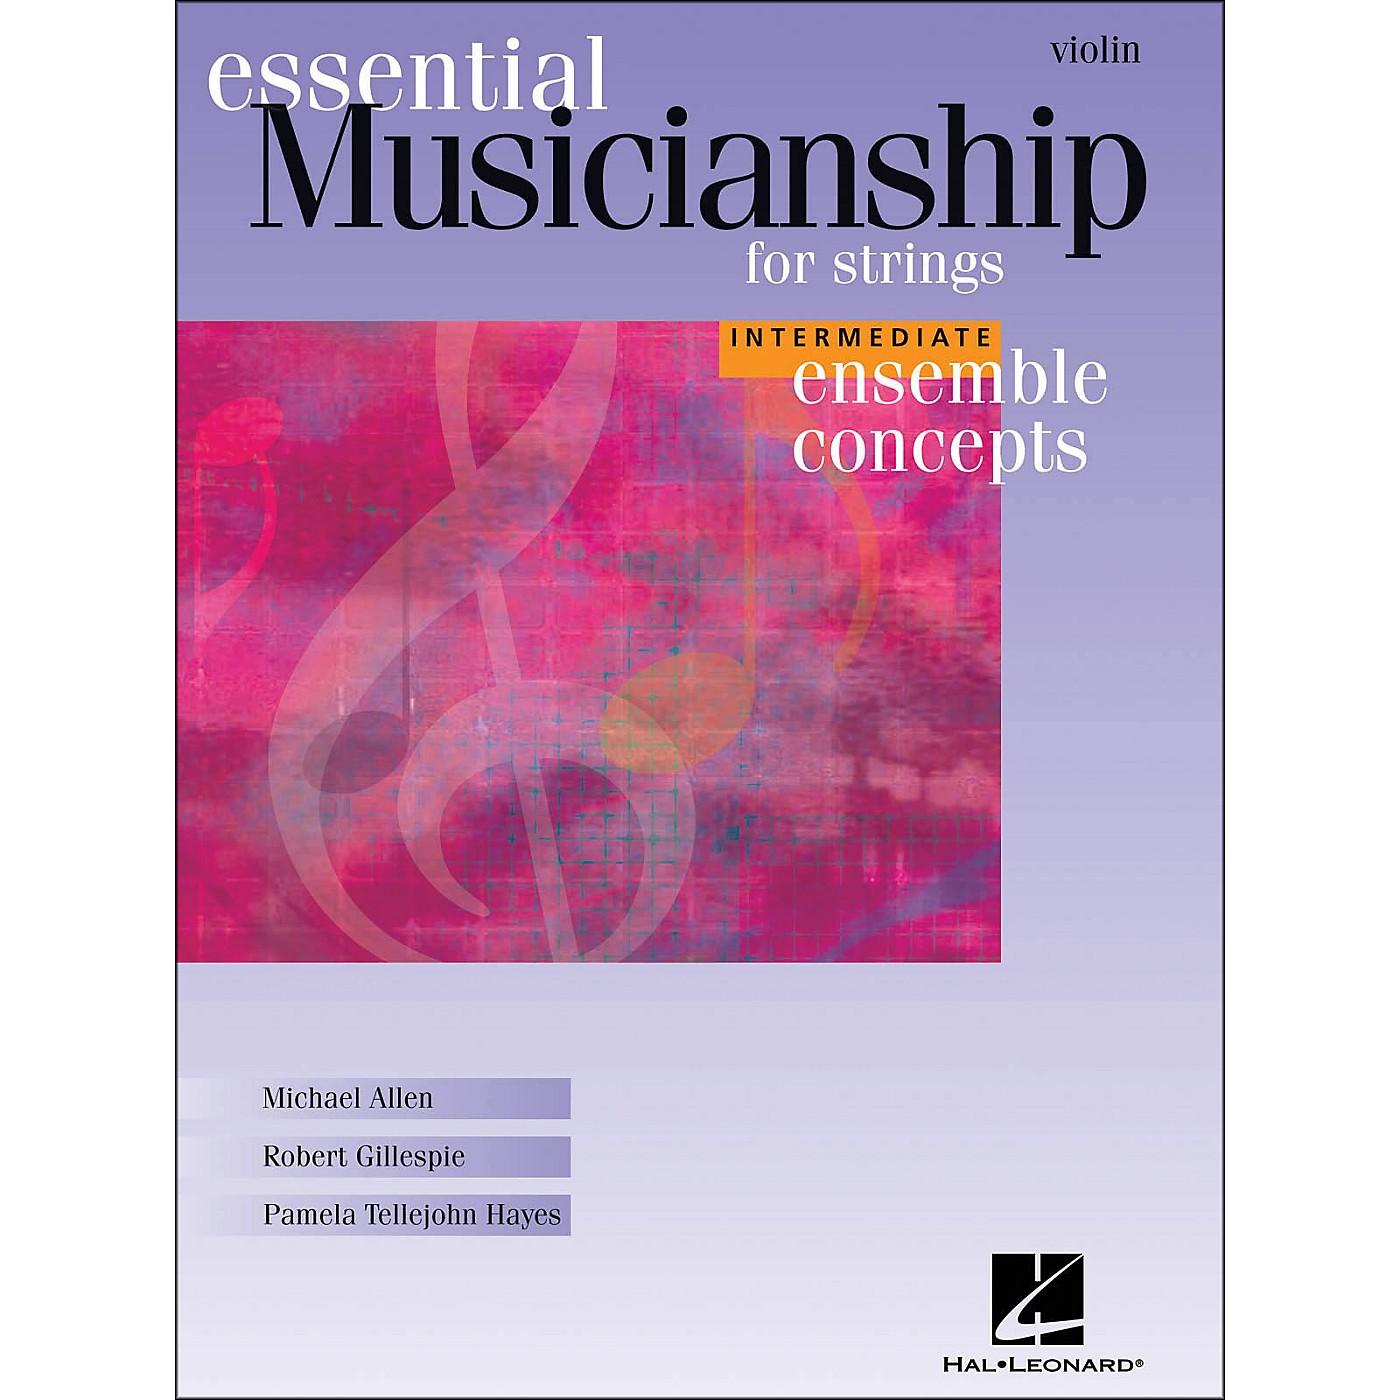 Hal Leonard Essential Musicianship for Strings - Ensemble Concepts Intermediate Violin thumbnail